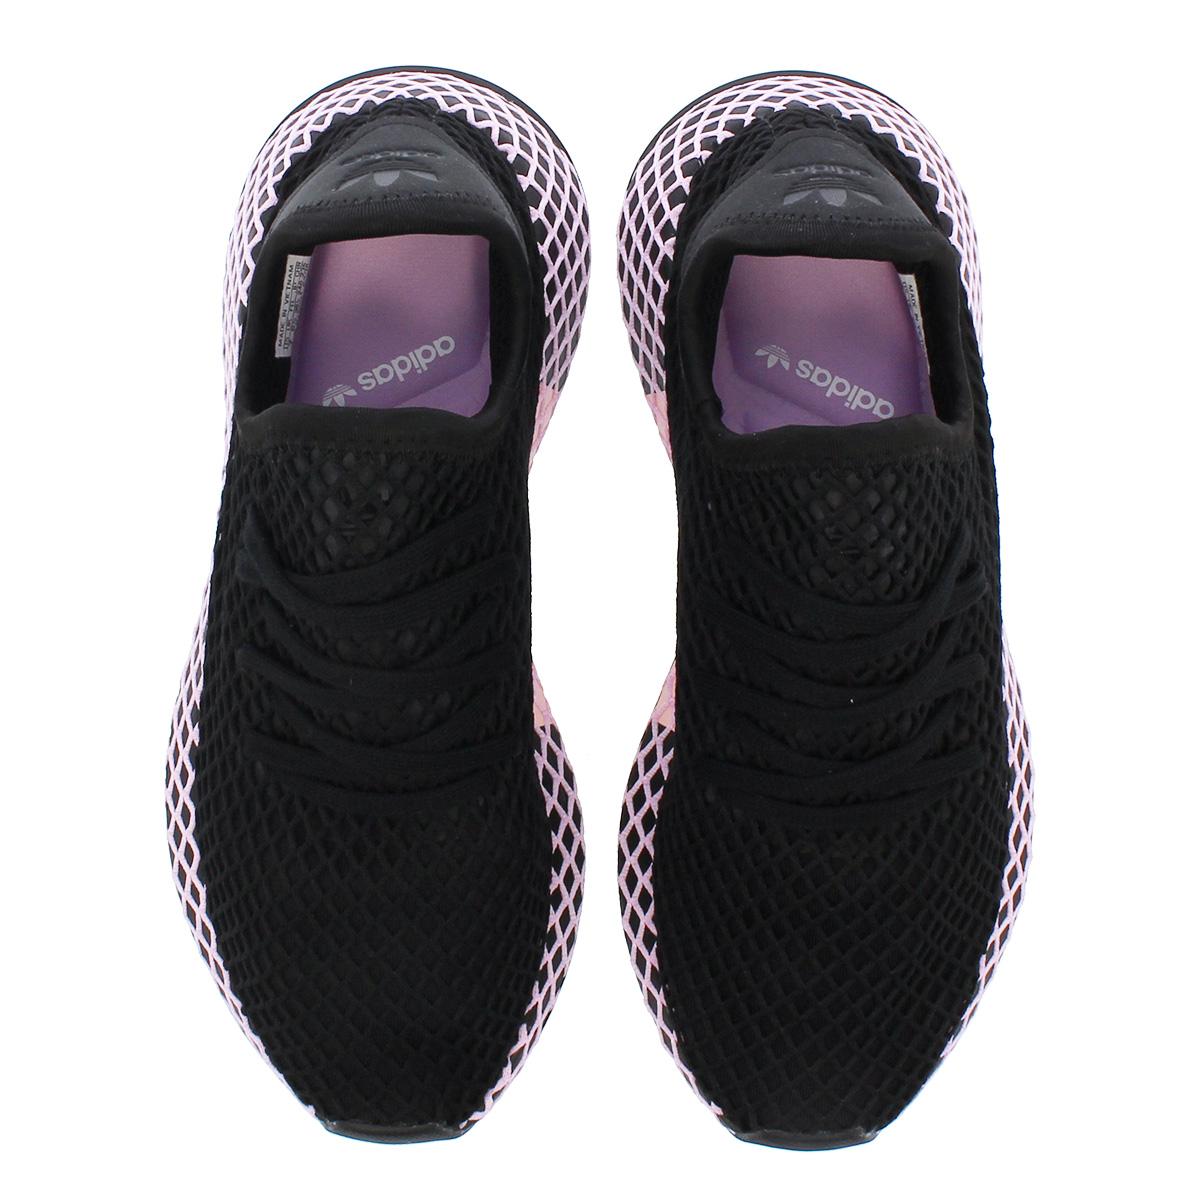 6da438672 adidas DEERUPT RUNNER W アディダスウィメンズディーラプトランナー CORE BLACK CORE BLACK CLEAR  LILAC b37602